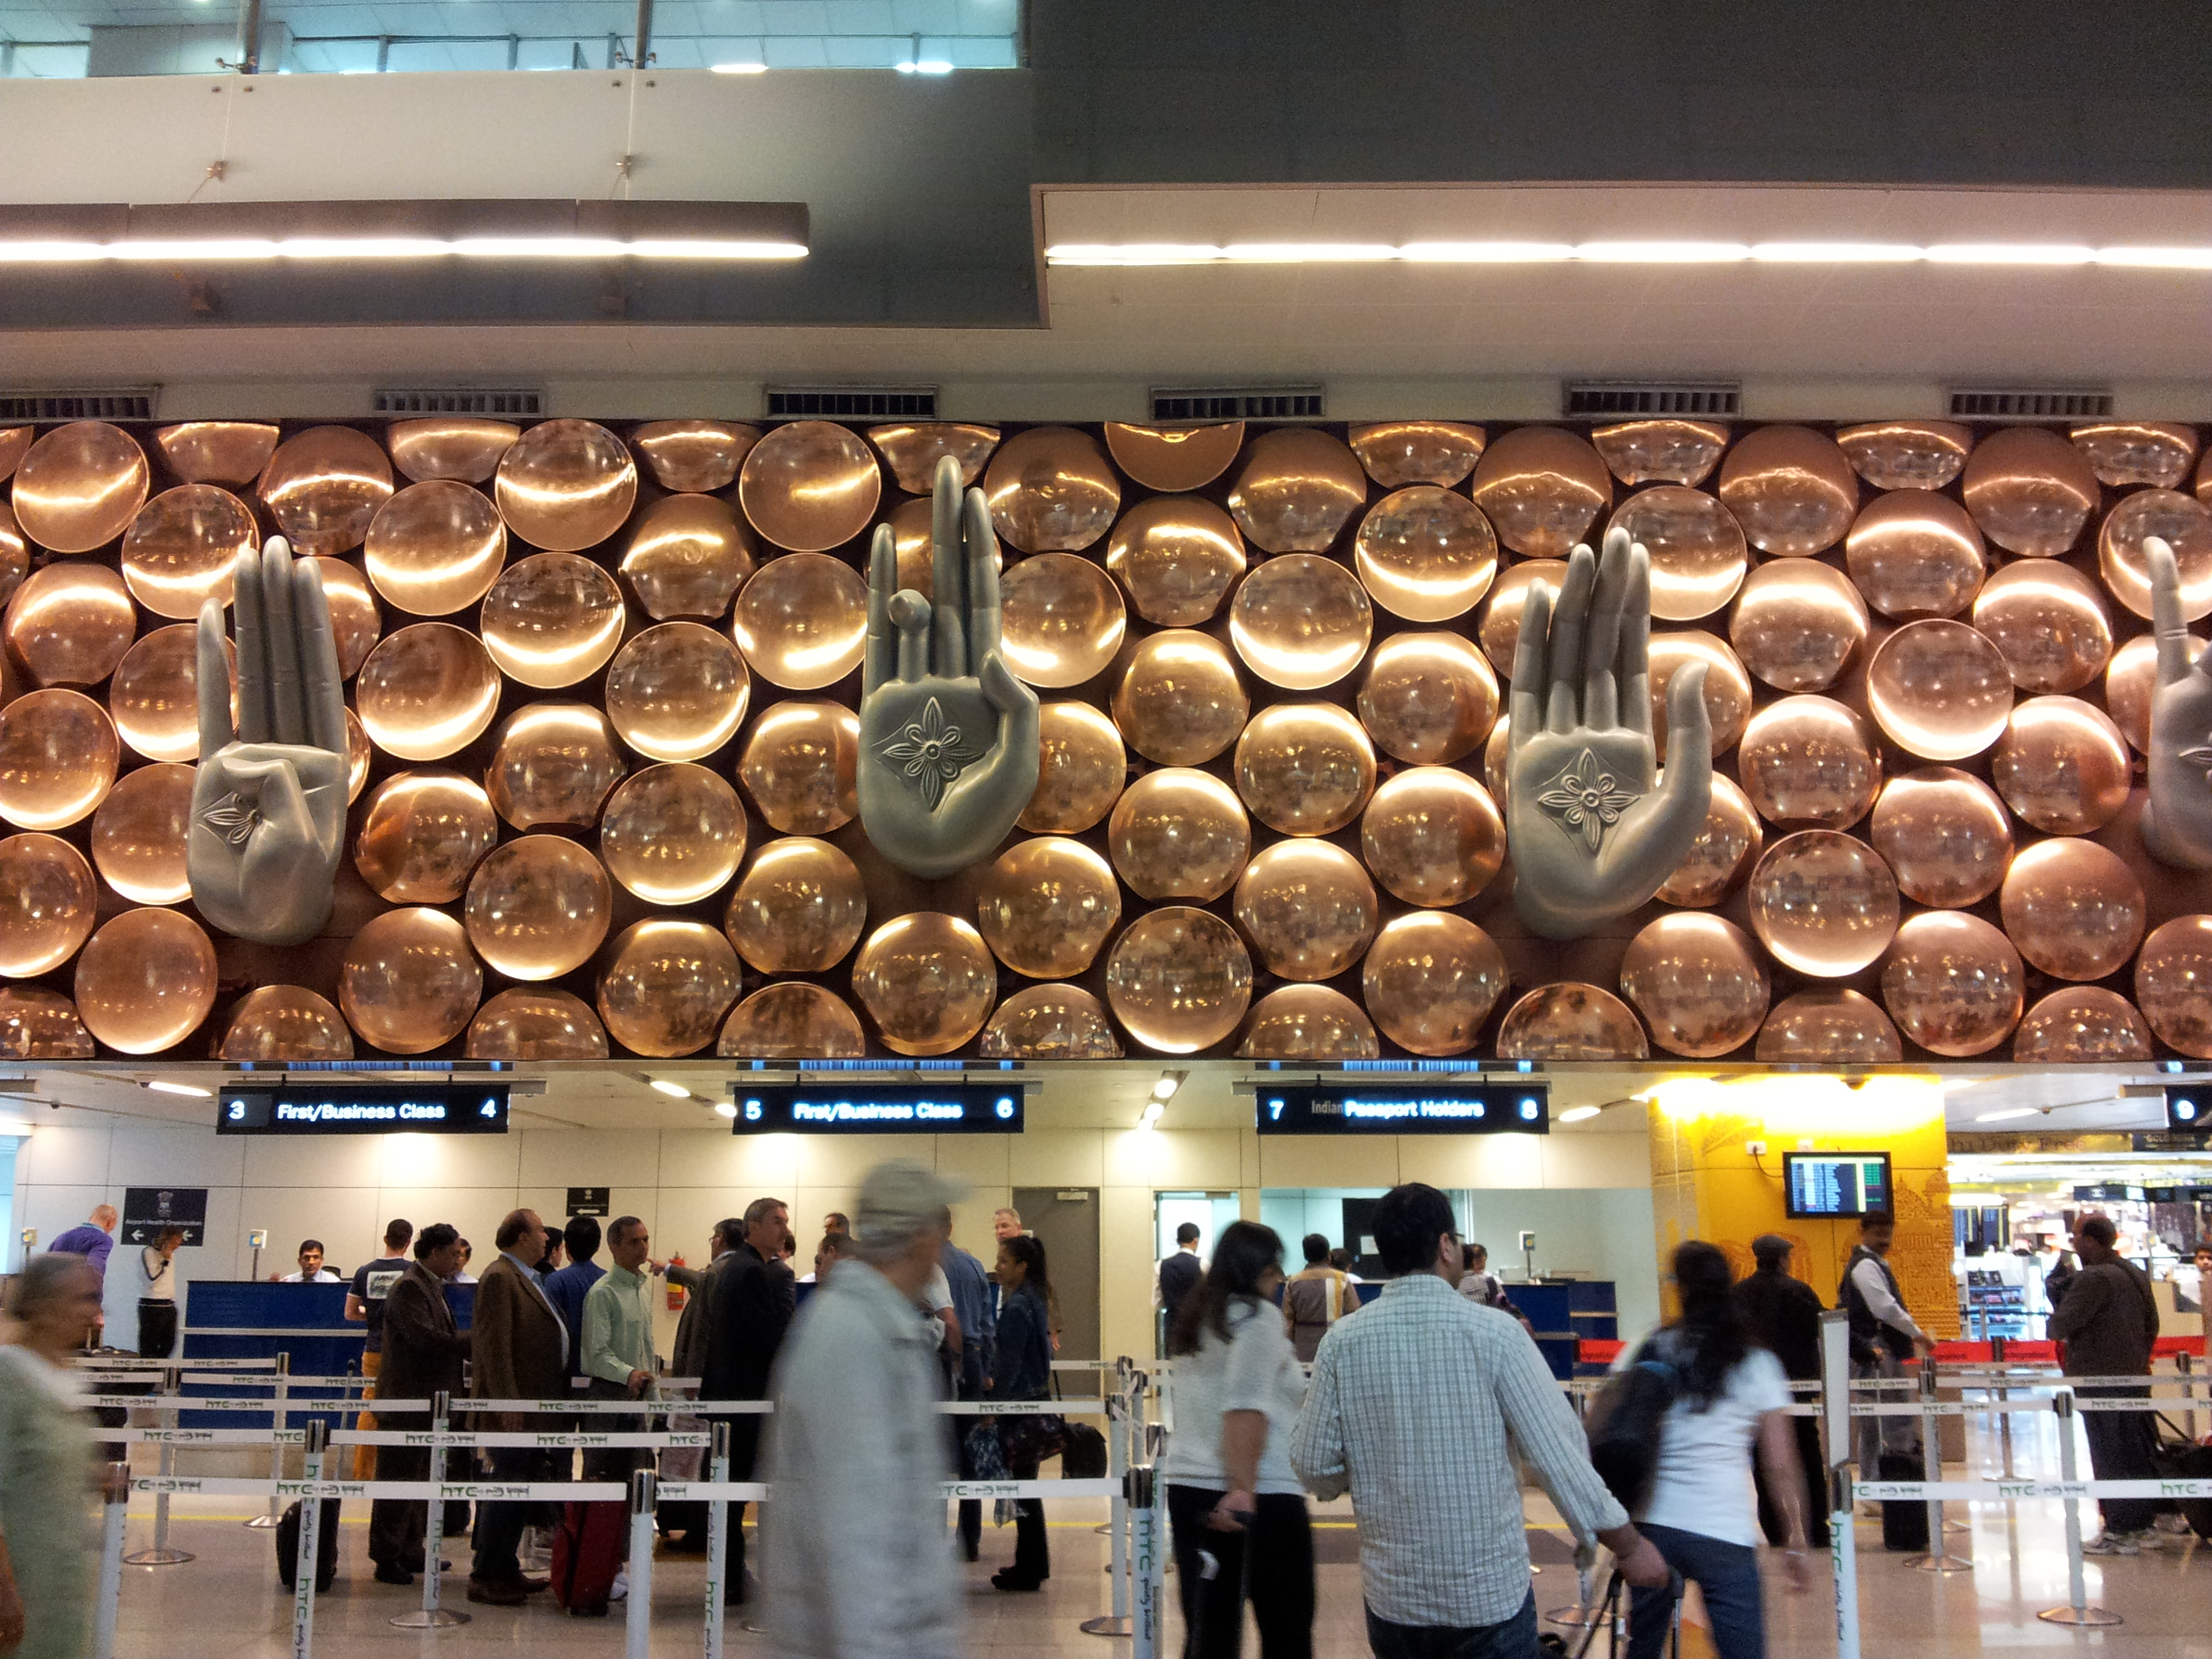 Delhi Airport, Travel to India, Travel India, Arriving in Delhi